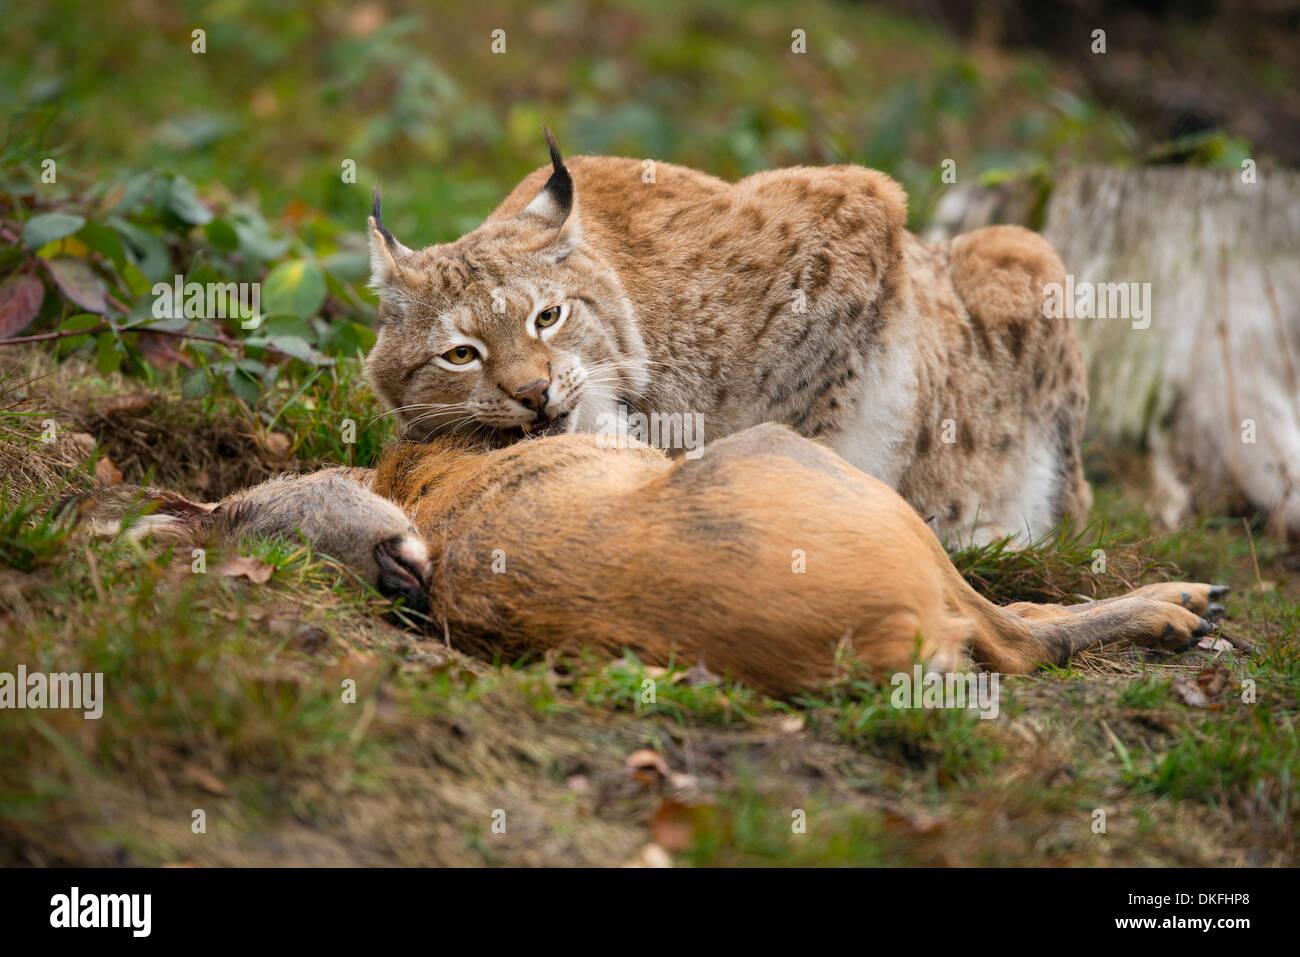 Lynx (Lynx lynx), male, with prey roe deer (Capreolus capreolus), captive, Thuringia, Germany - Stock Image